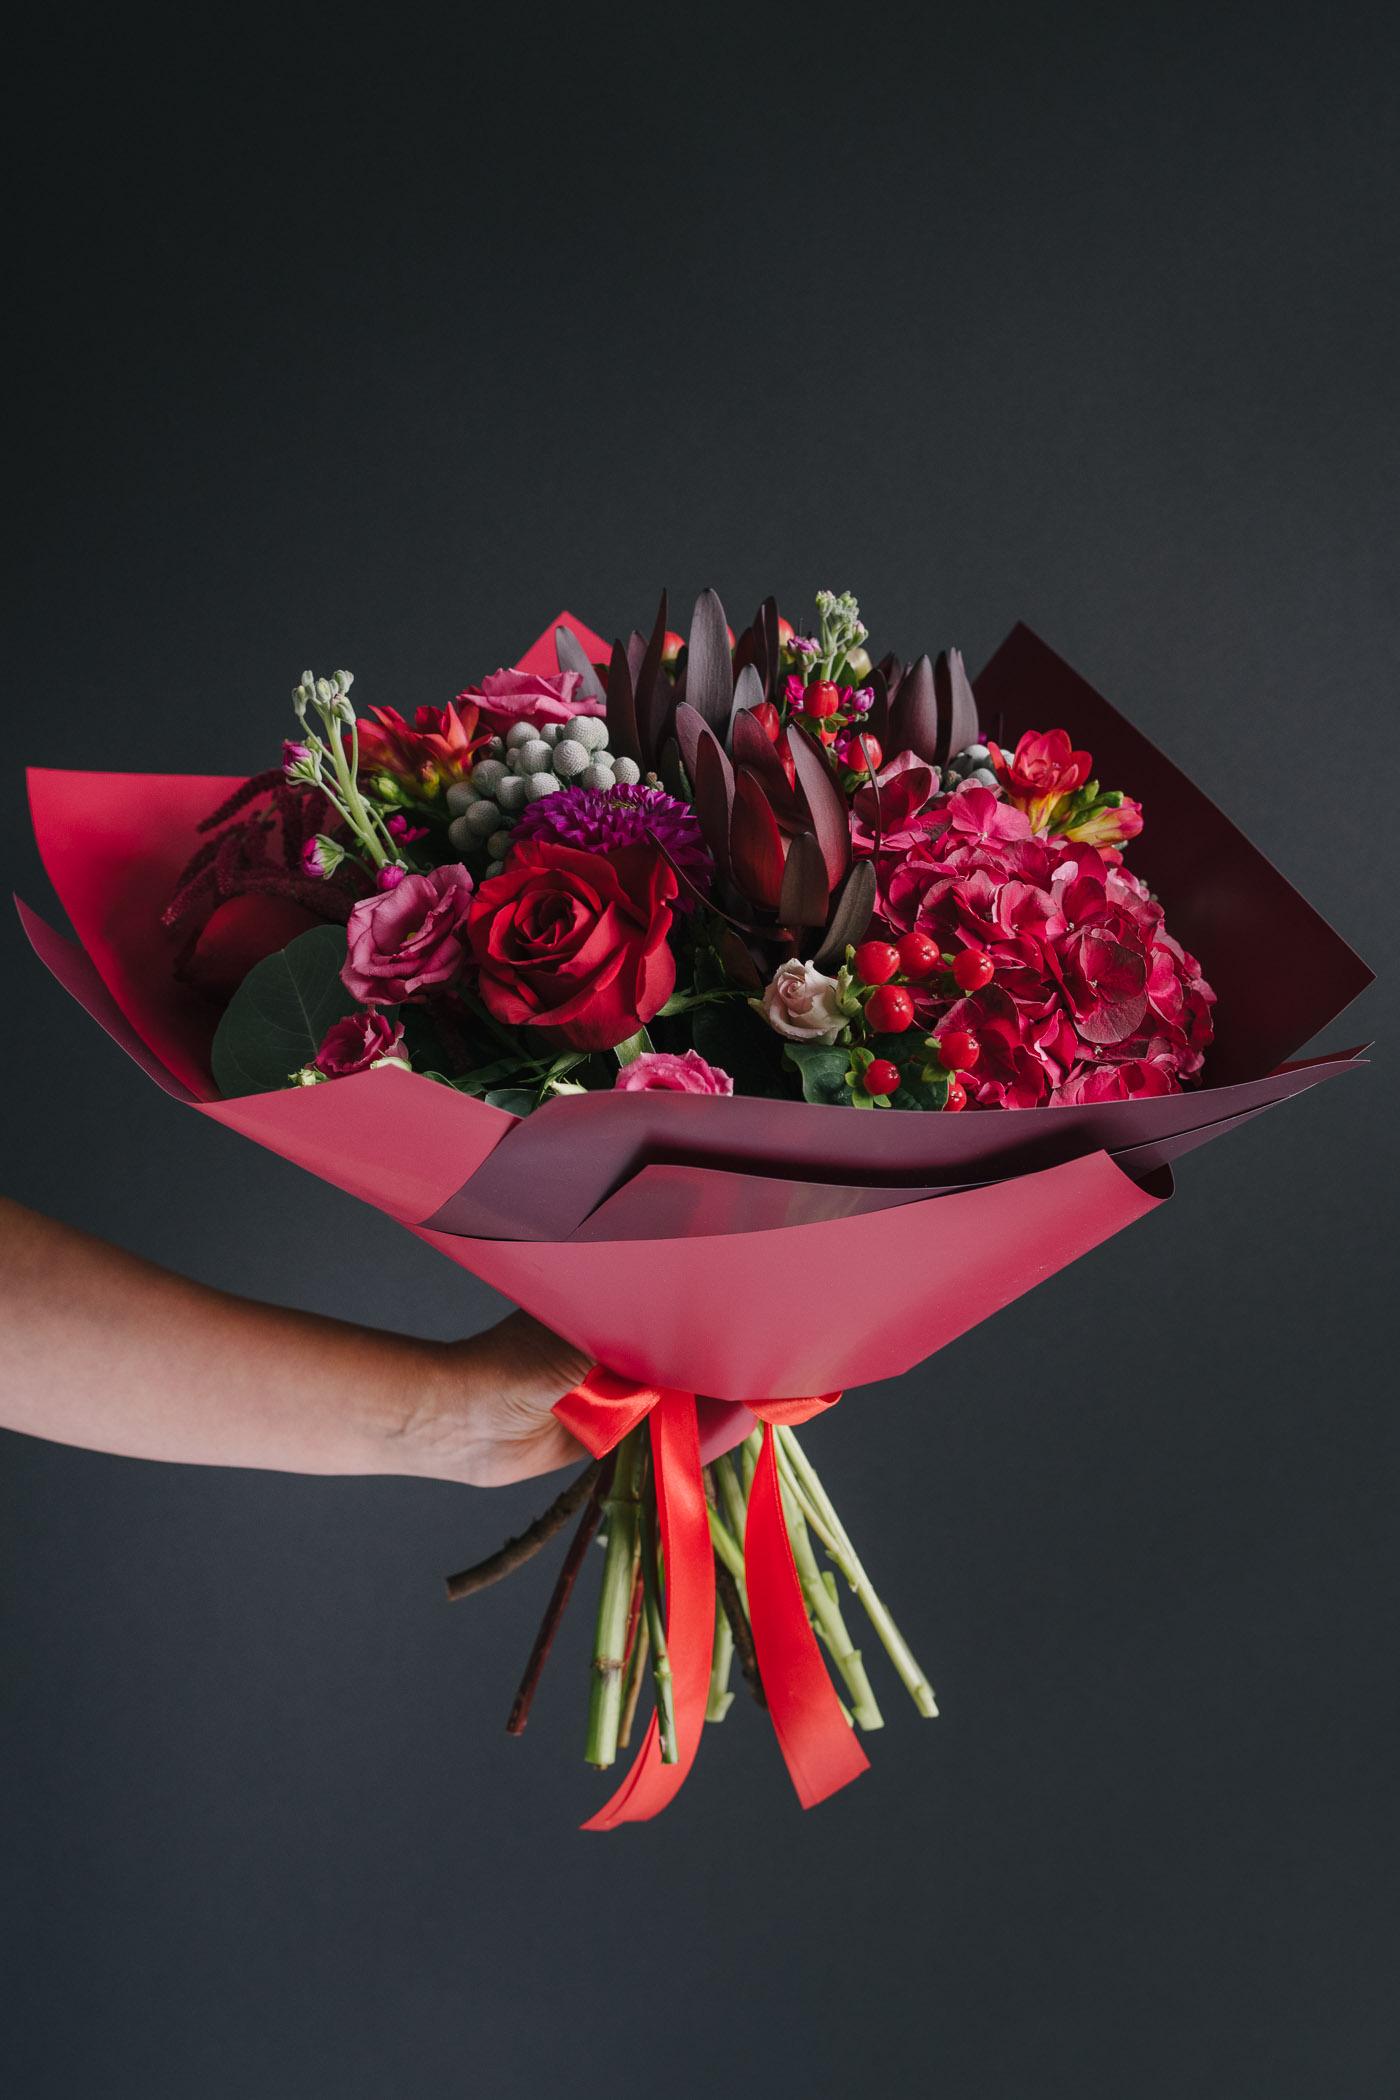 Buchet de flori in culori de toamna